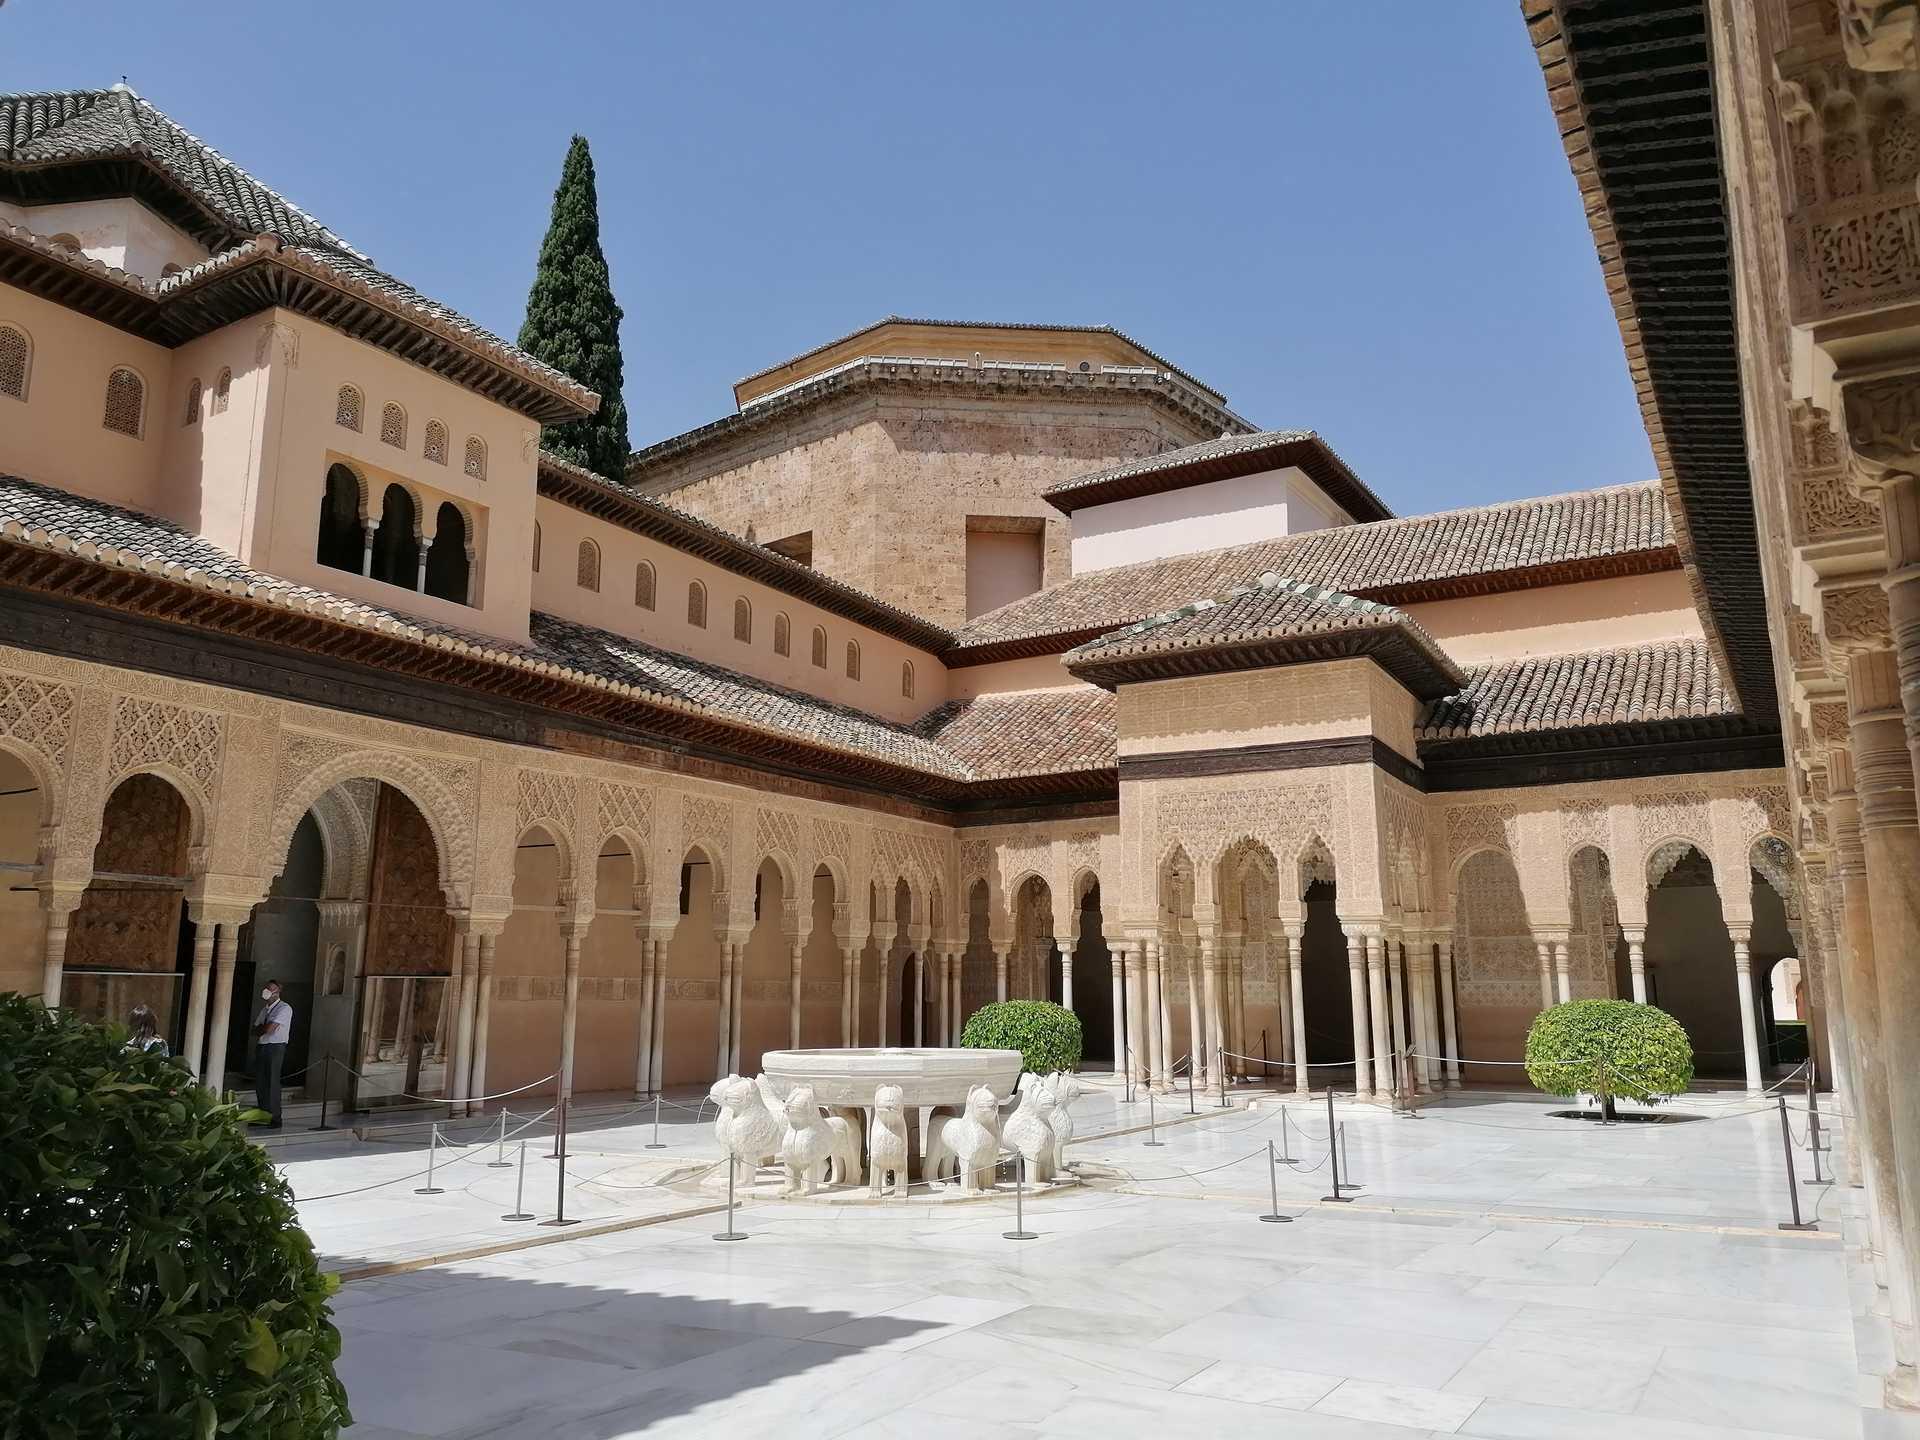 La Alhambra sentida. Una experiencia única